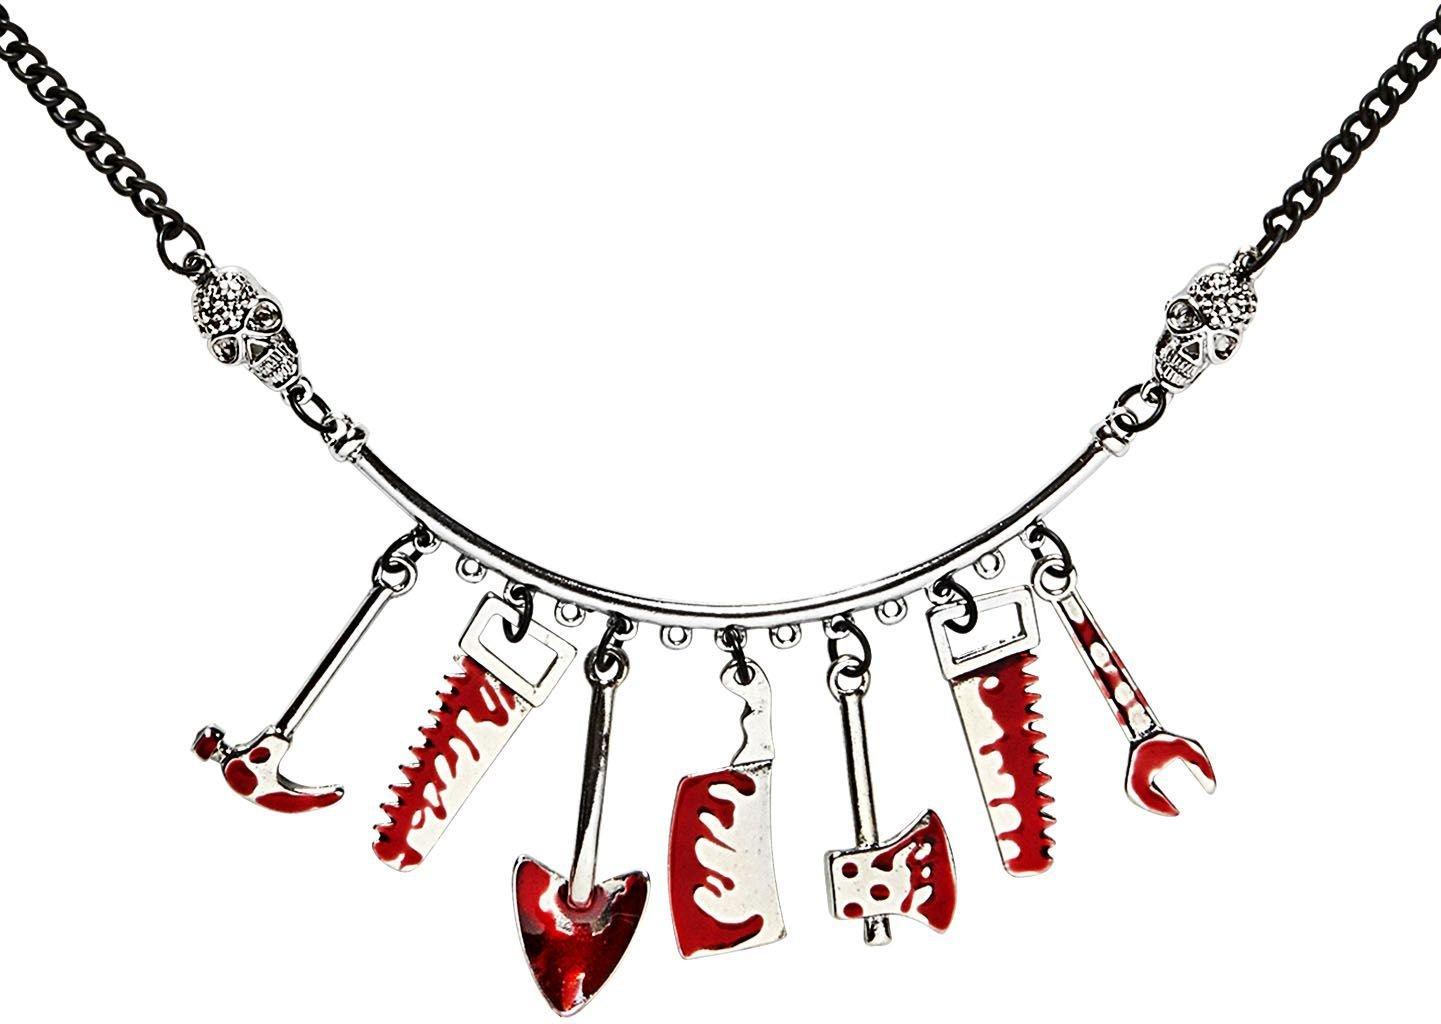 Bloederige psychopaat ketting